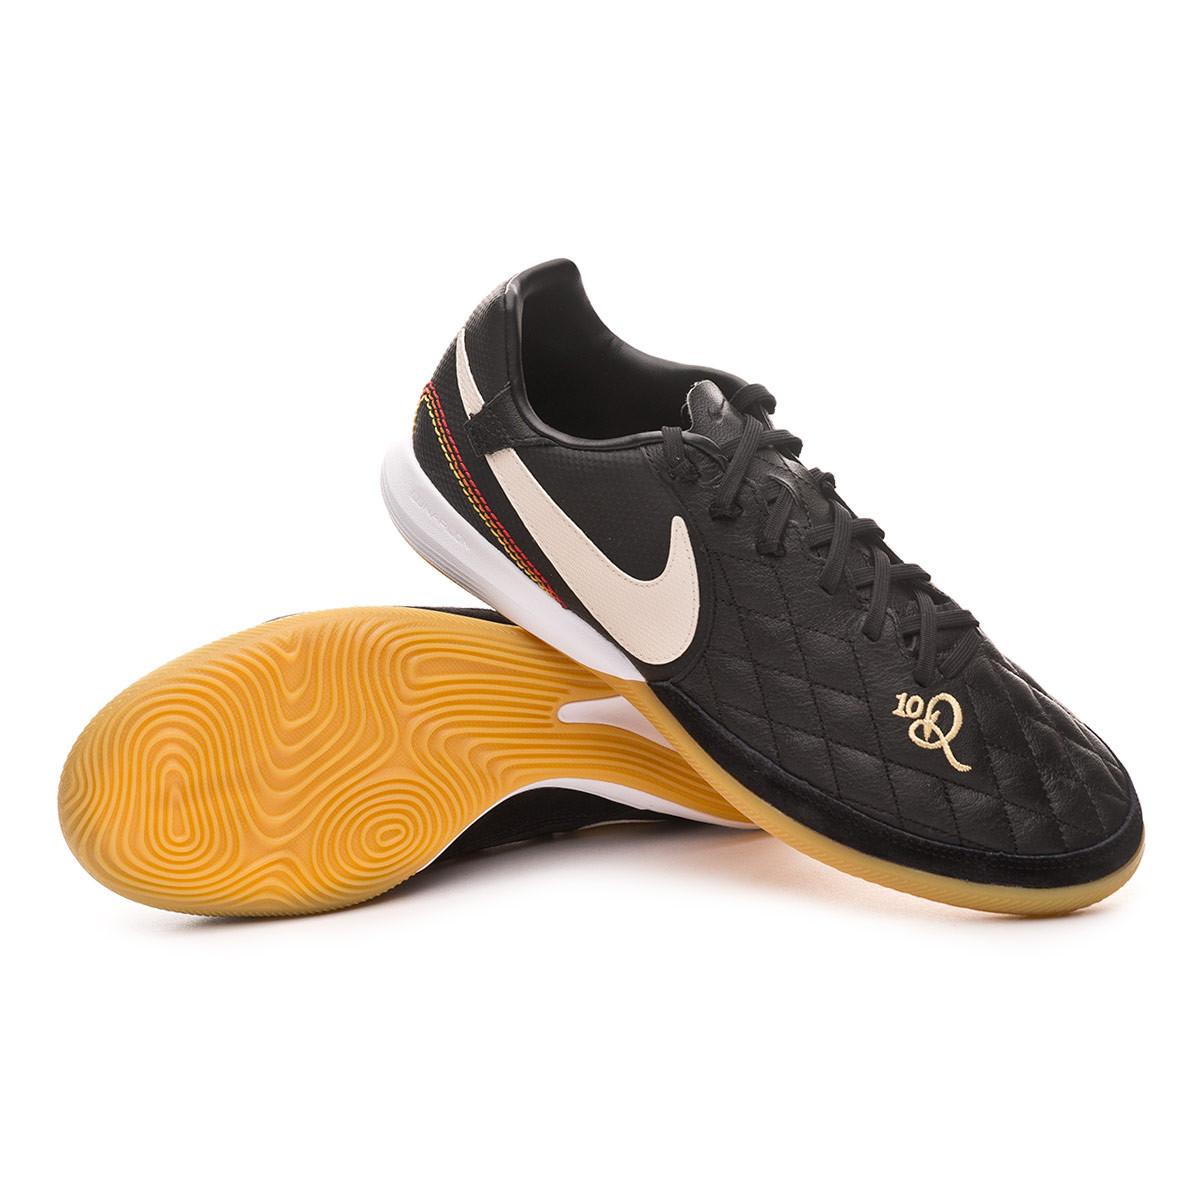 b45433718c1 Futsal Boot Nike Lunar LegendX VII Pro 10R IC Black-Light orewood-Metallic  gold - Football store Fútbol Emotion